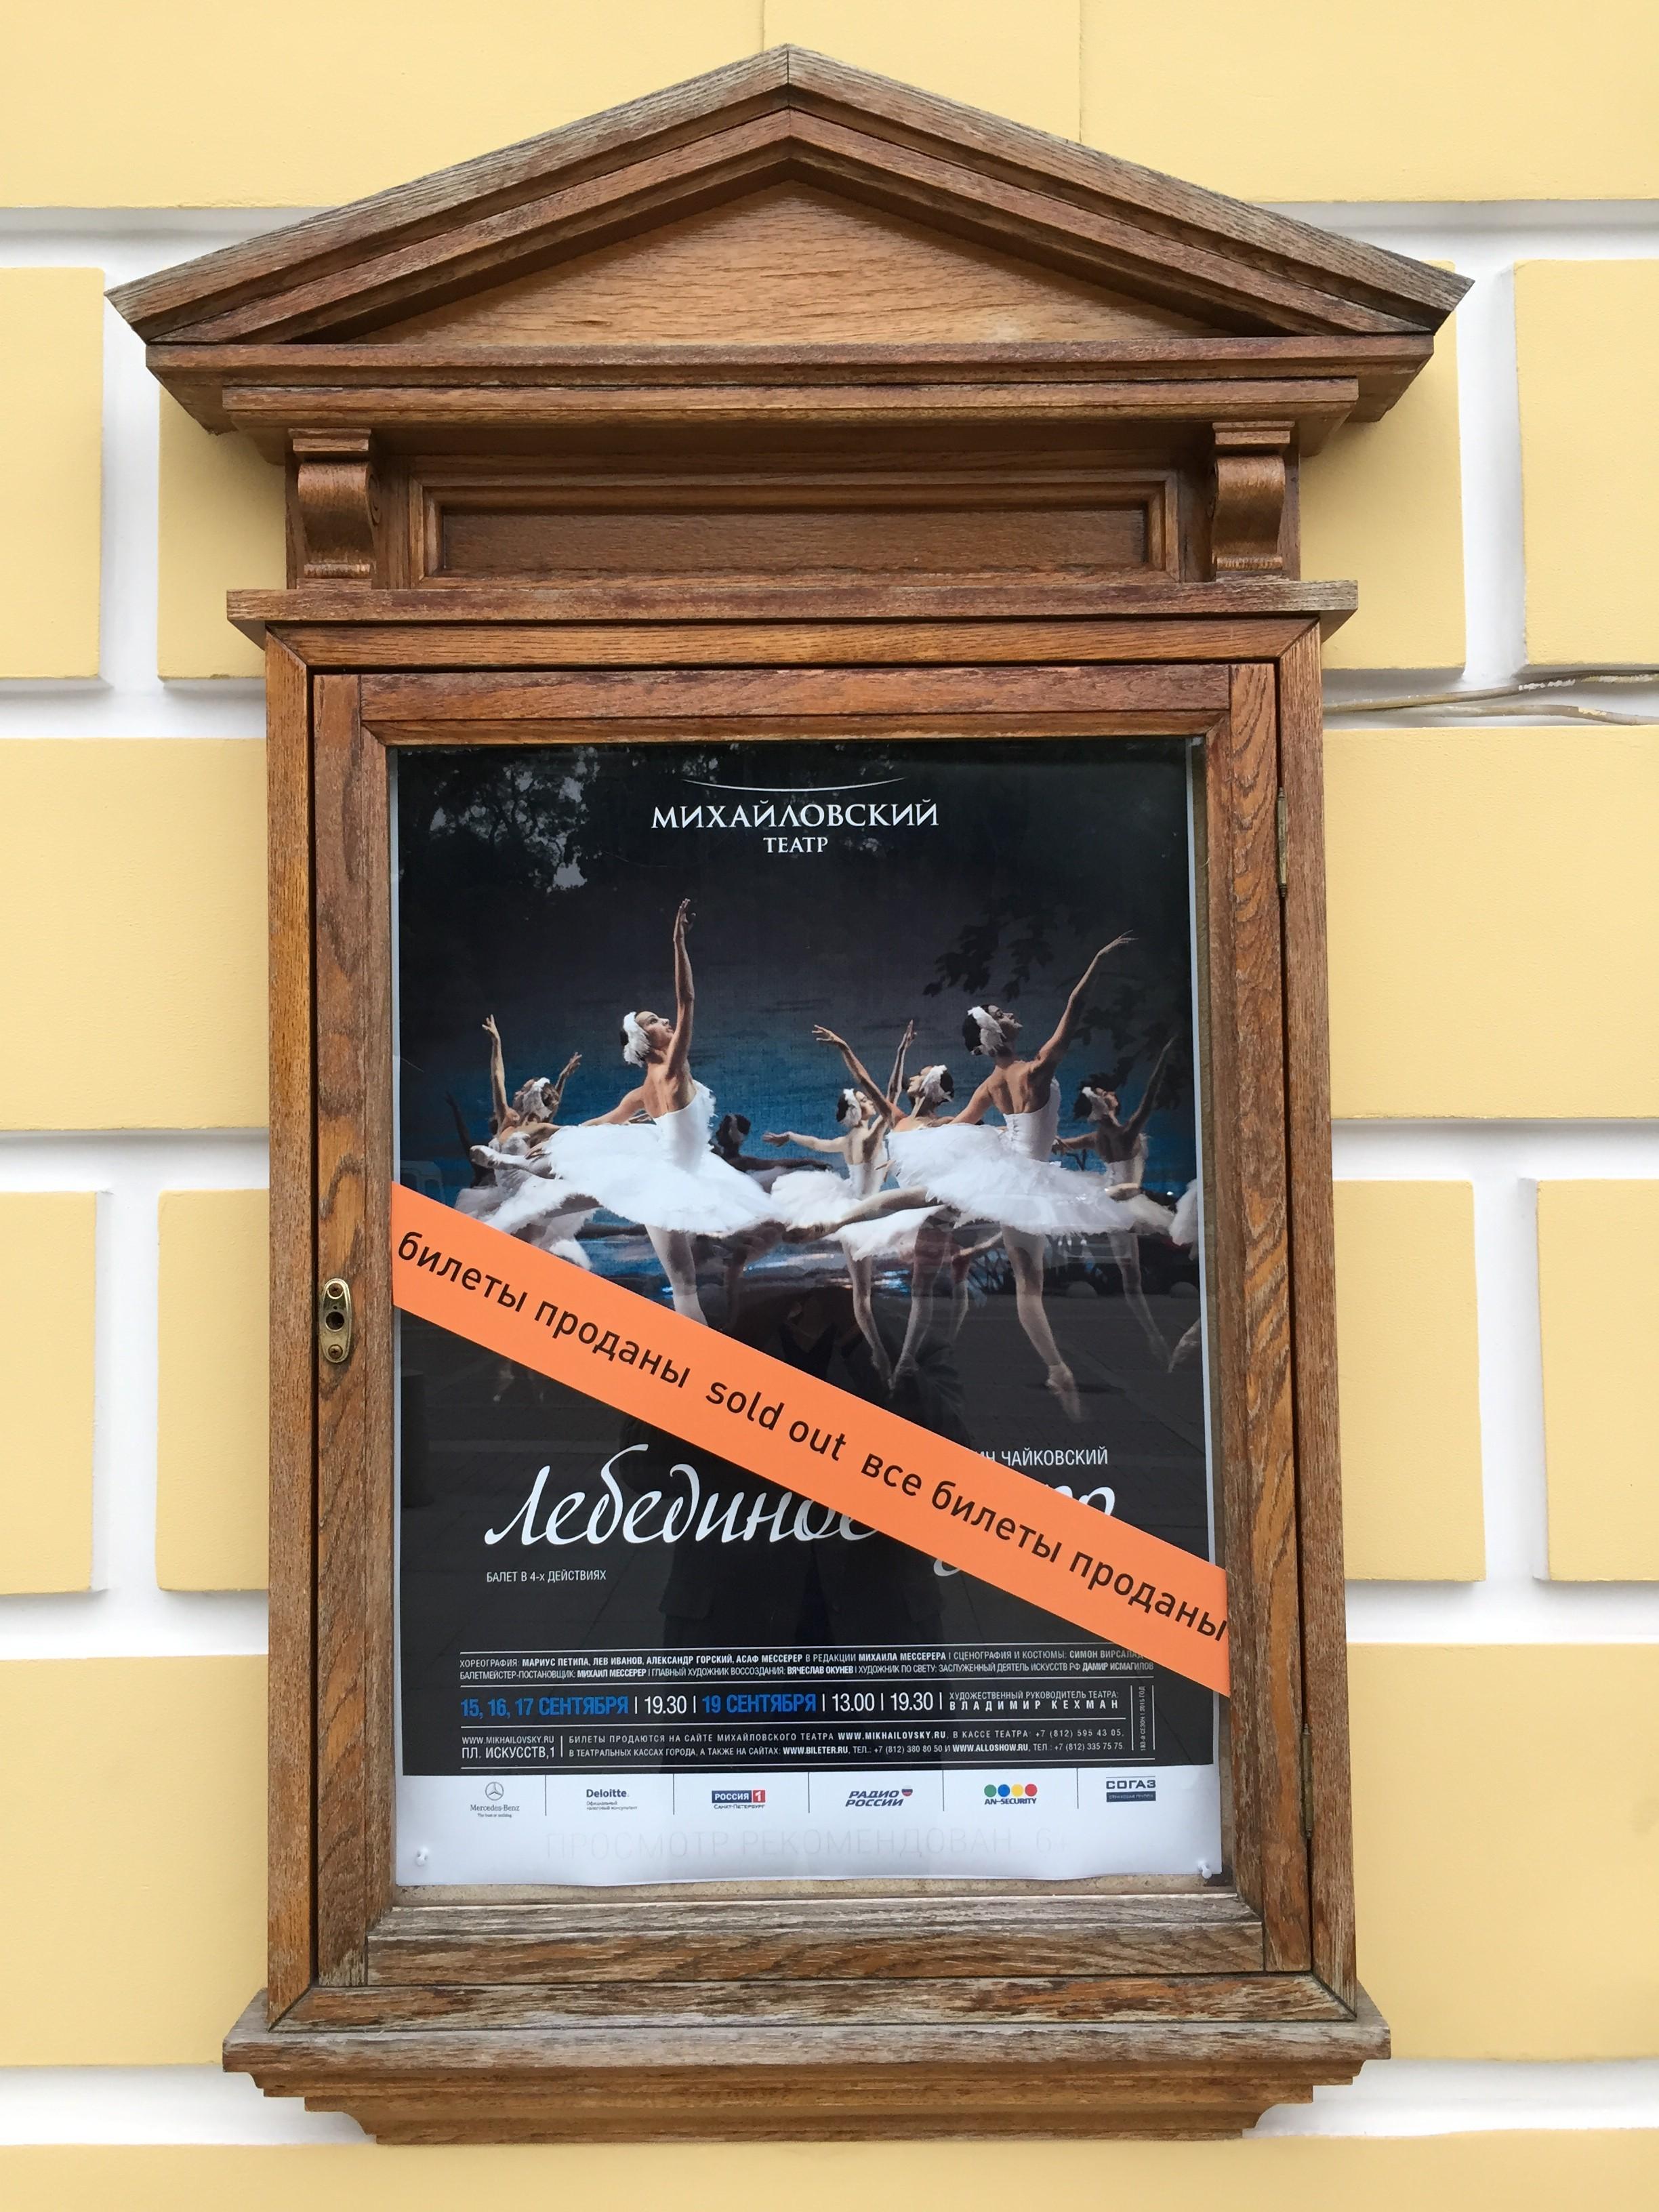 mikailovsky ballet swan lake st petersburg 09